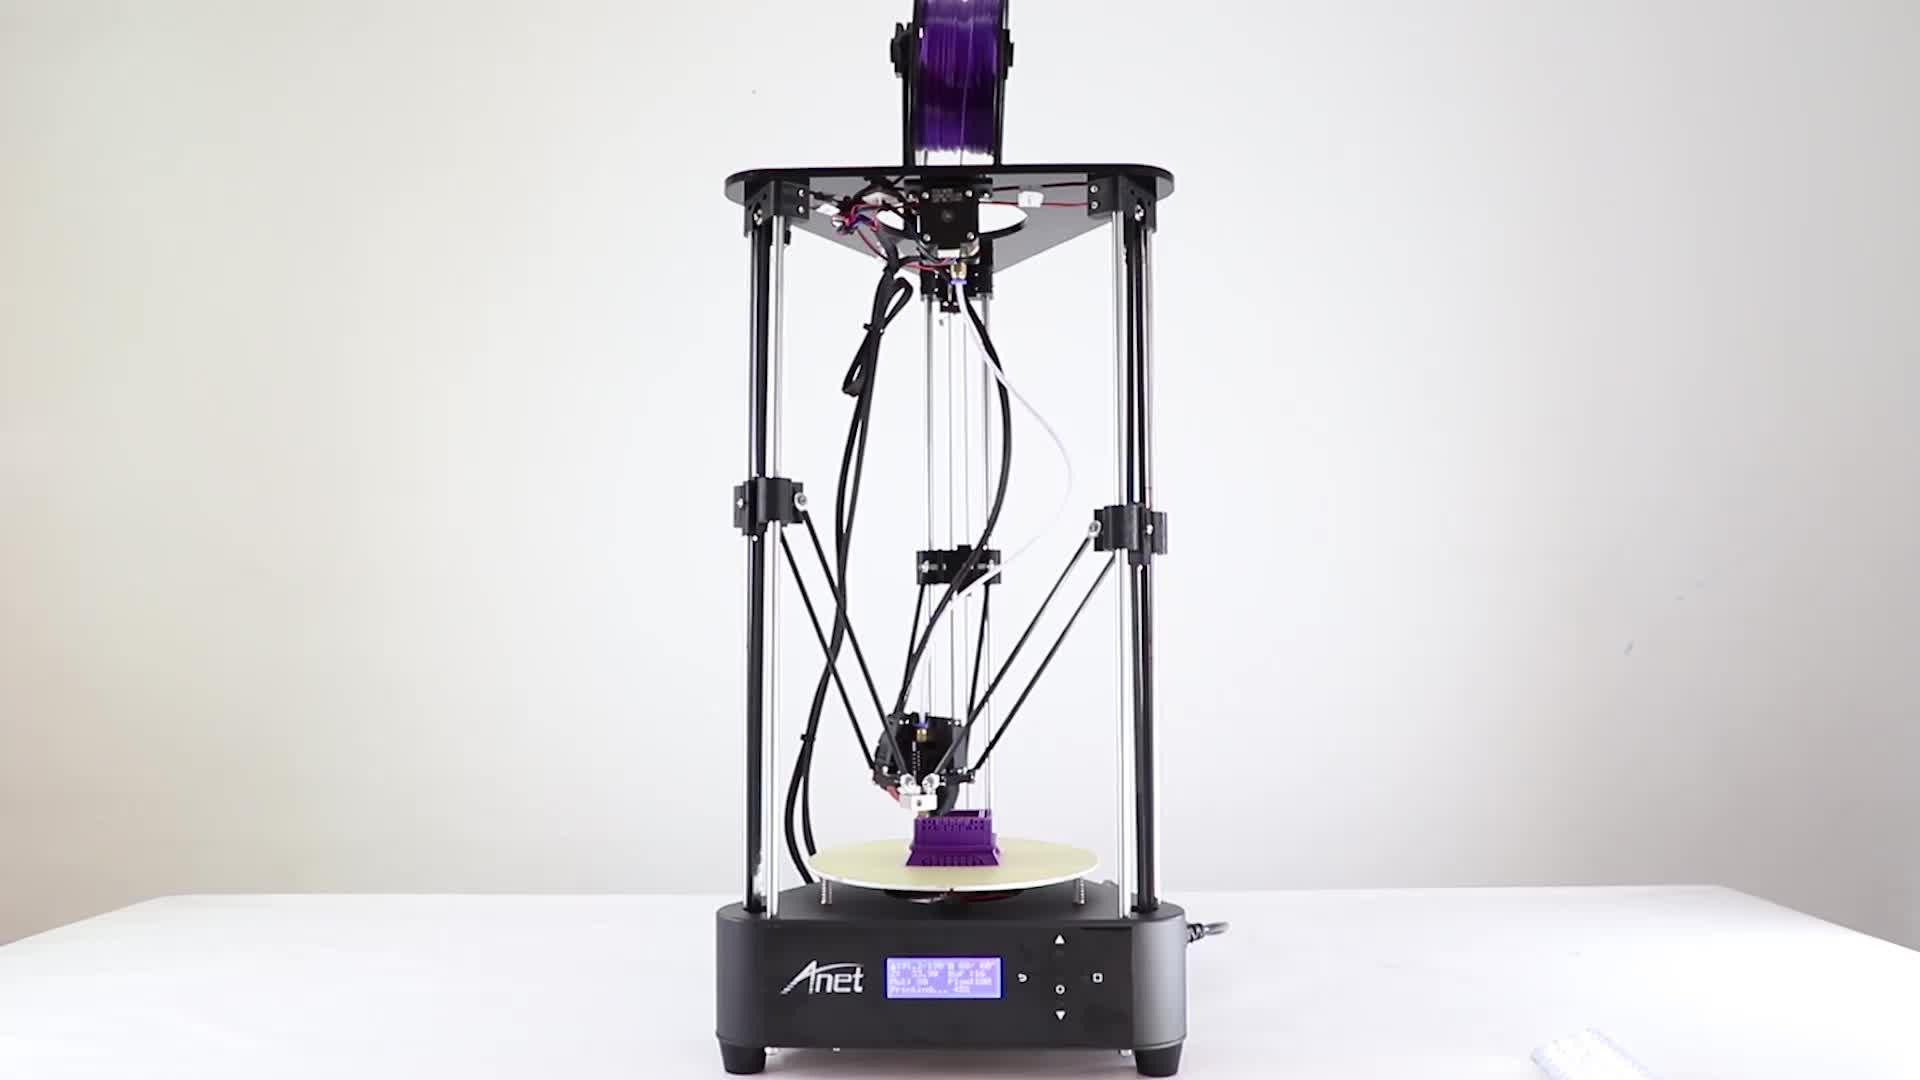 Fácil de montar mini anet portátil 3d máquina impresora para juguetes